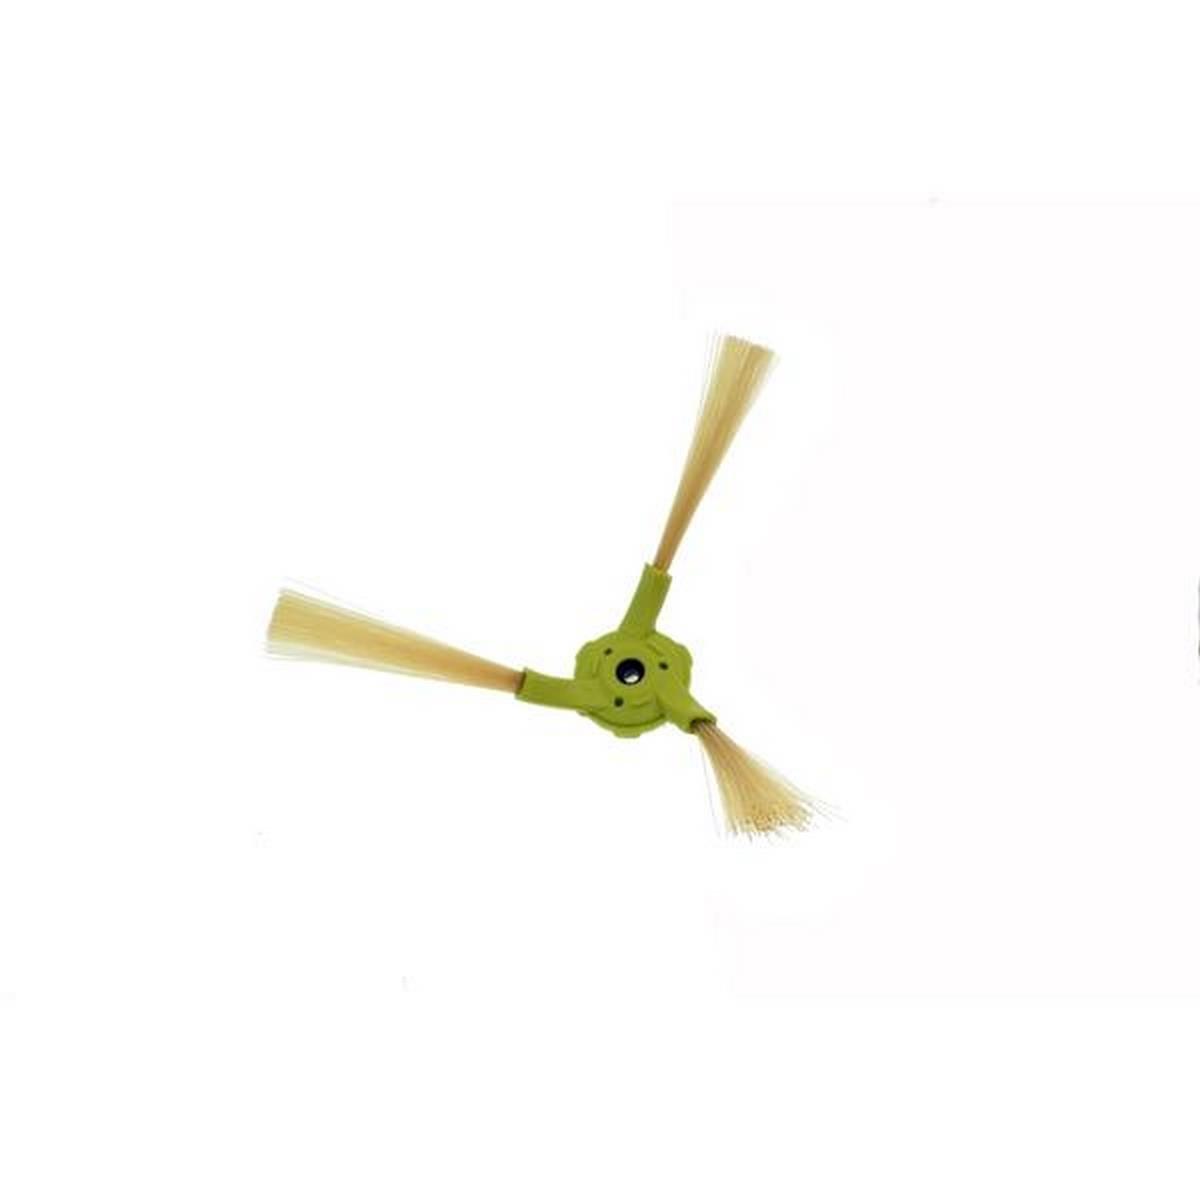 Cepillo en plumero izquierda (aab2) - Robot aspirador - LG: Amazon ...